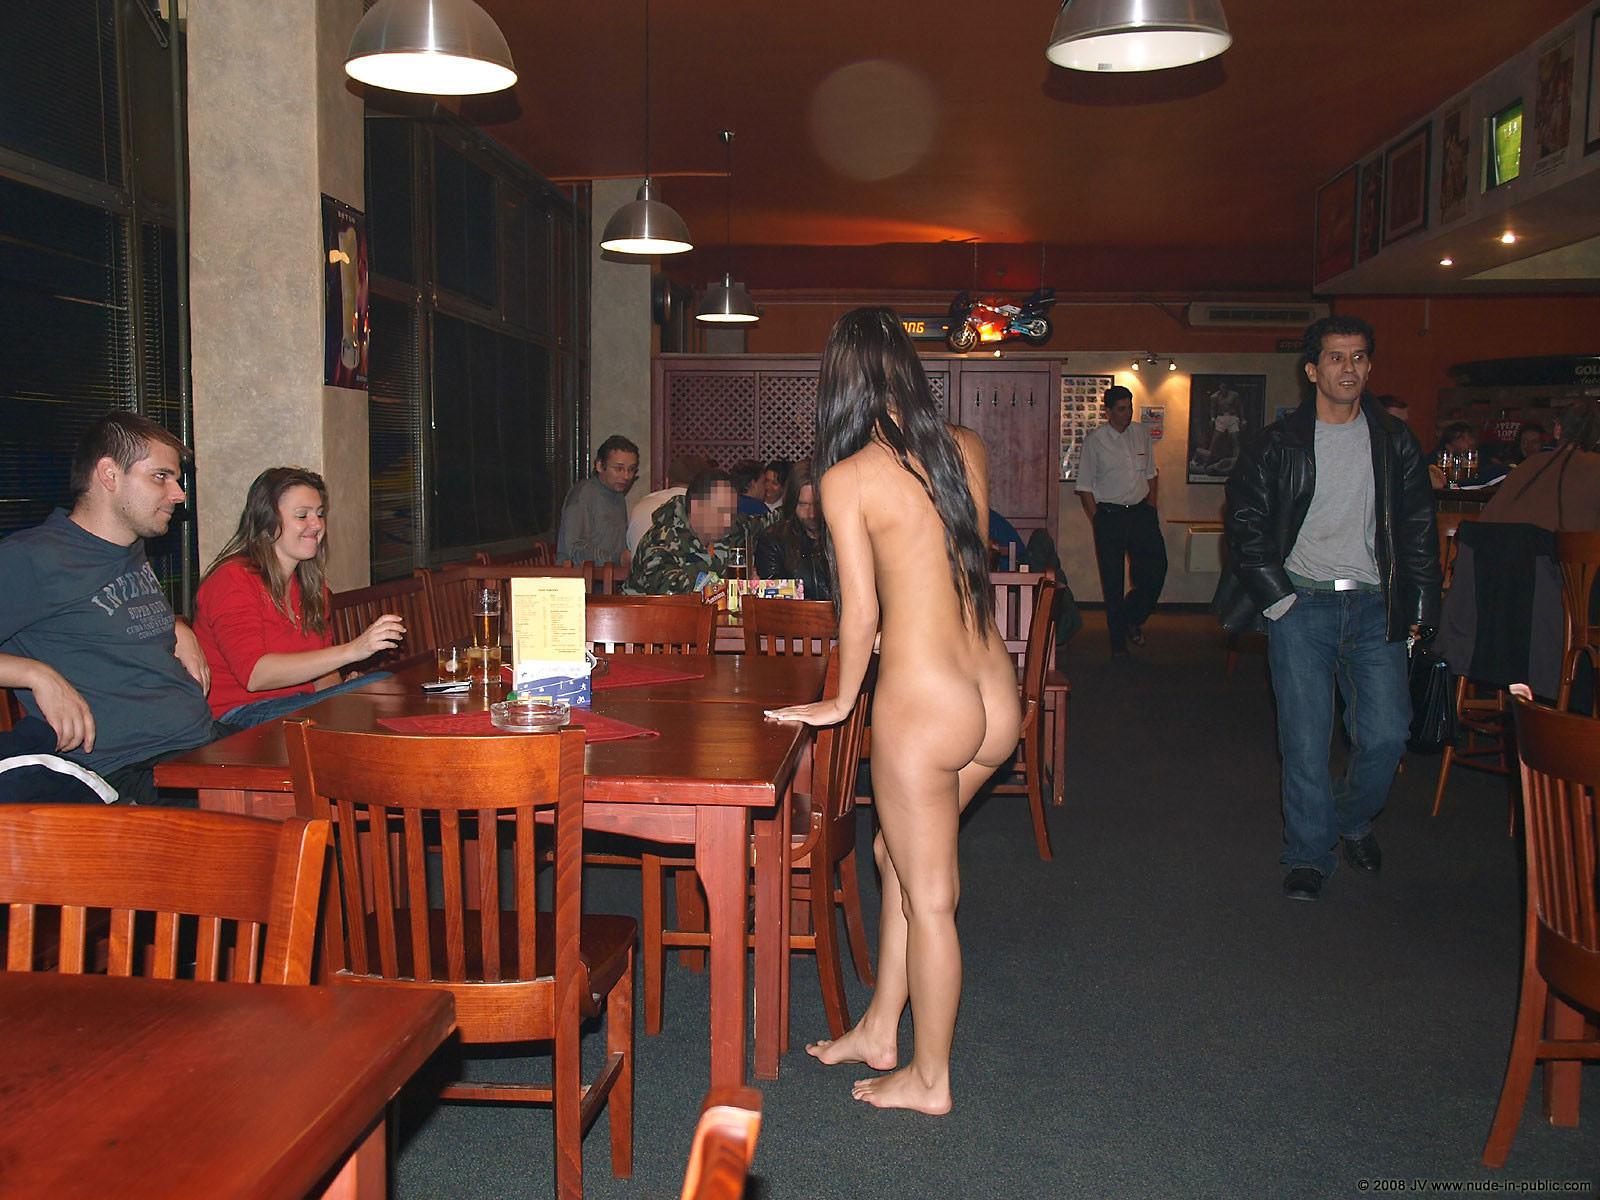 melisa-pub-beer-bar-girl-nude-in-public-10